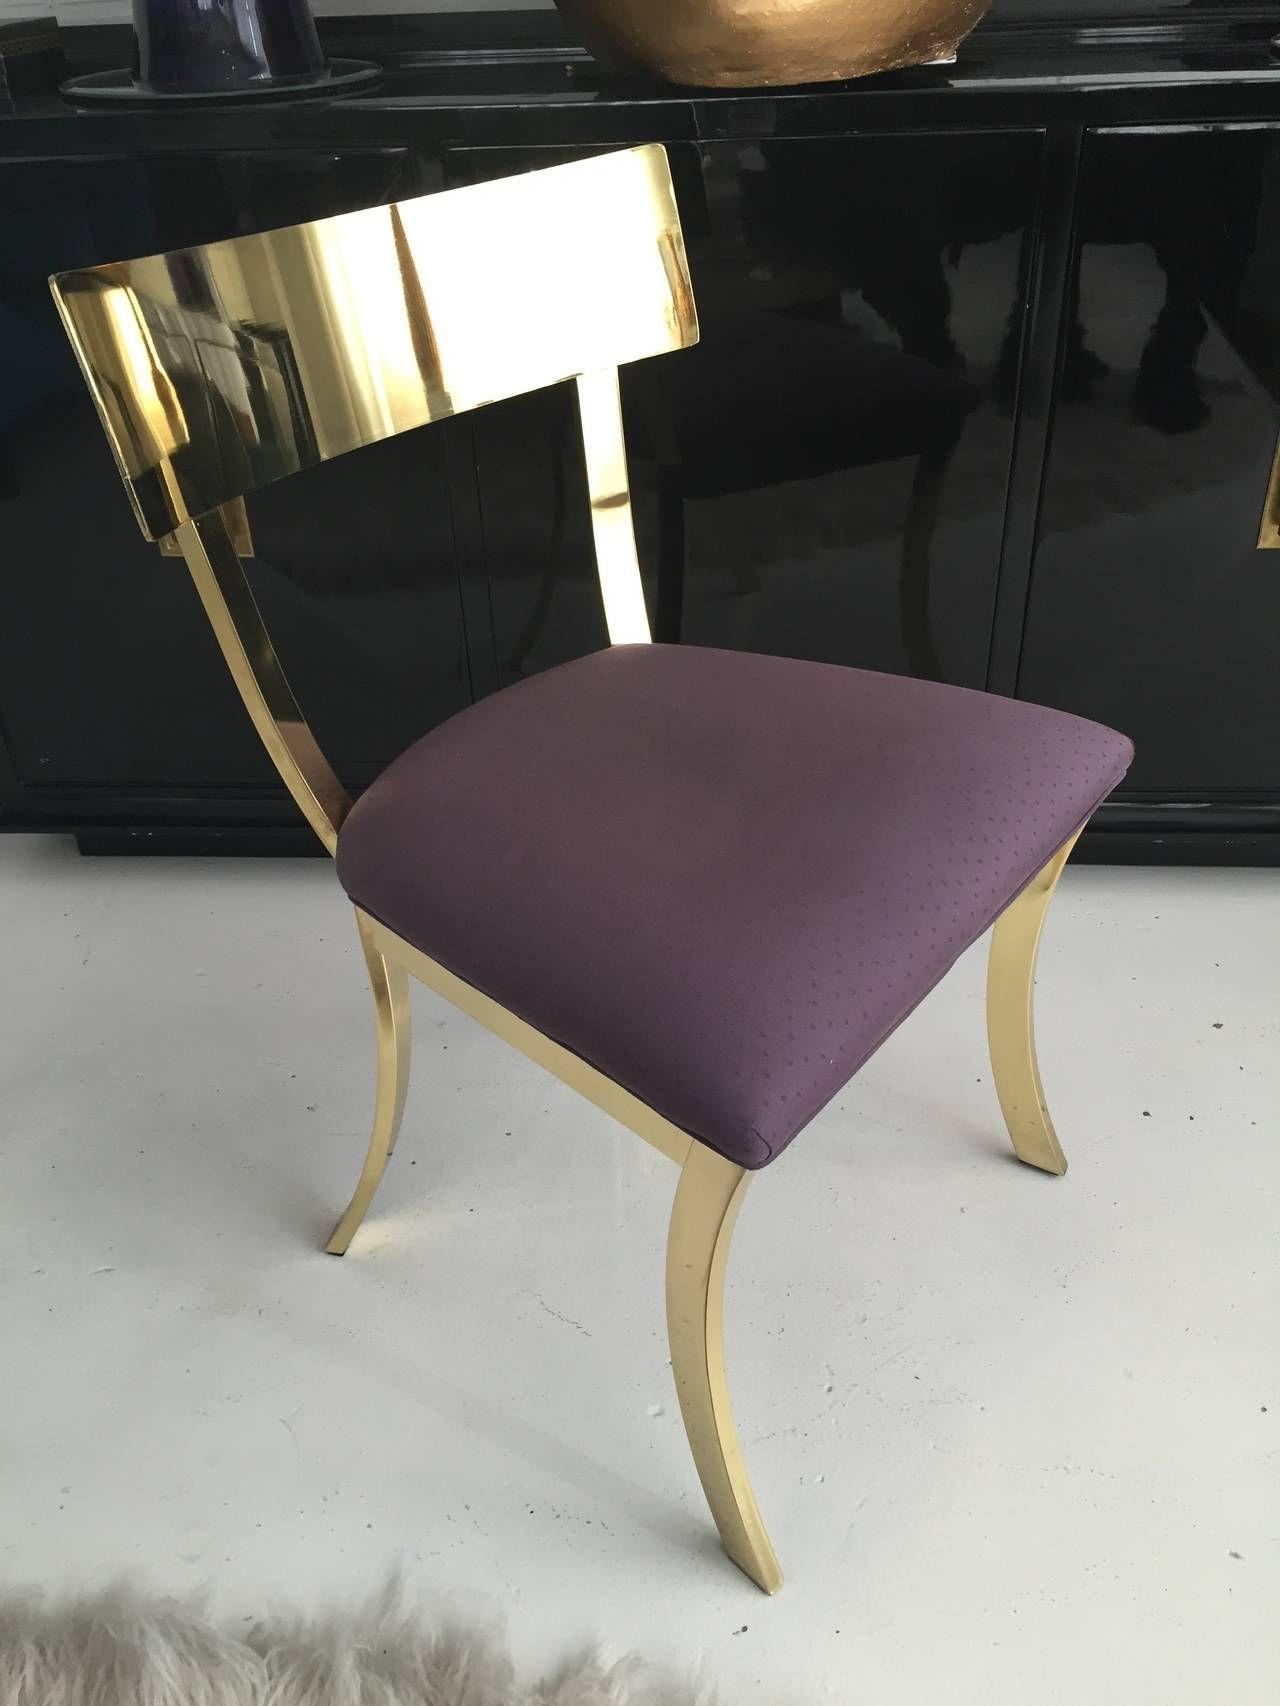 Superb Stunning Polished Brass Klismos Chair By Dia Interiors Unemploymentrelief Wooden Chair Designs For Living Room Unemploymentrelieforg